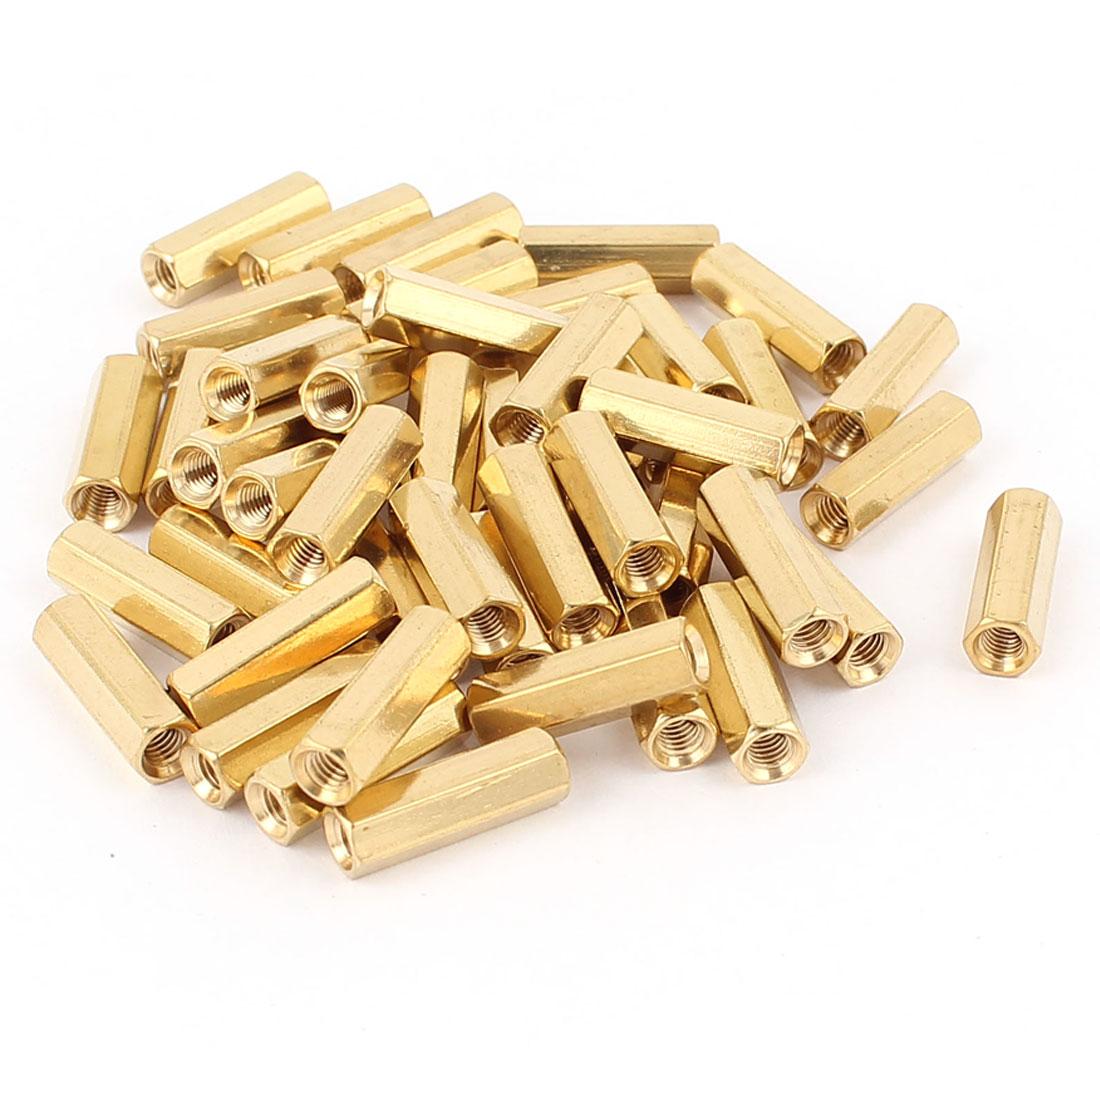 46Pcs M3 x 15mm Female/Female Thread Brass Hex Standoff PCB Pillar Spacer